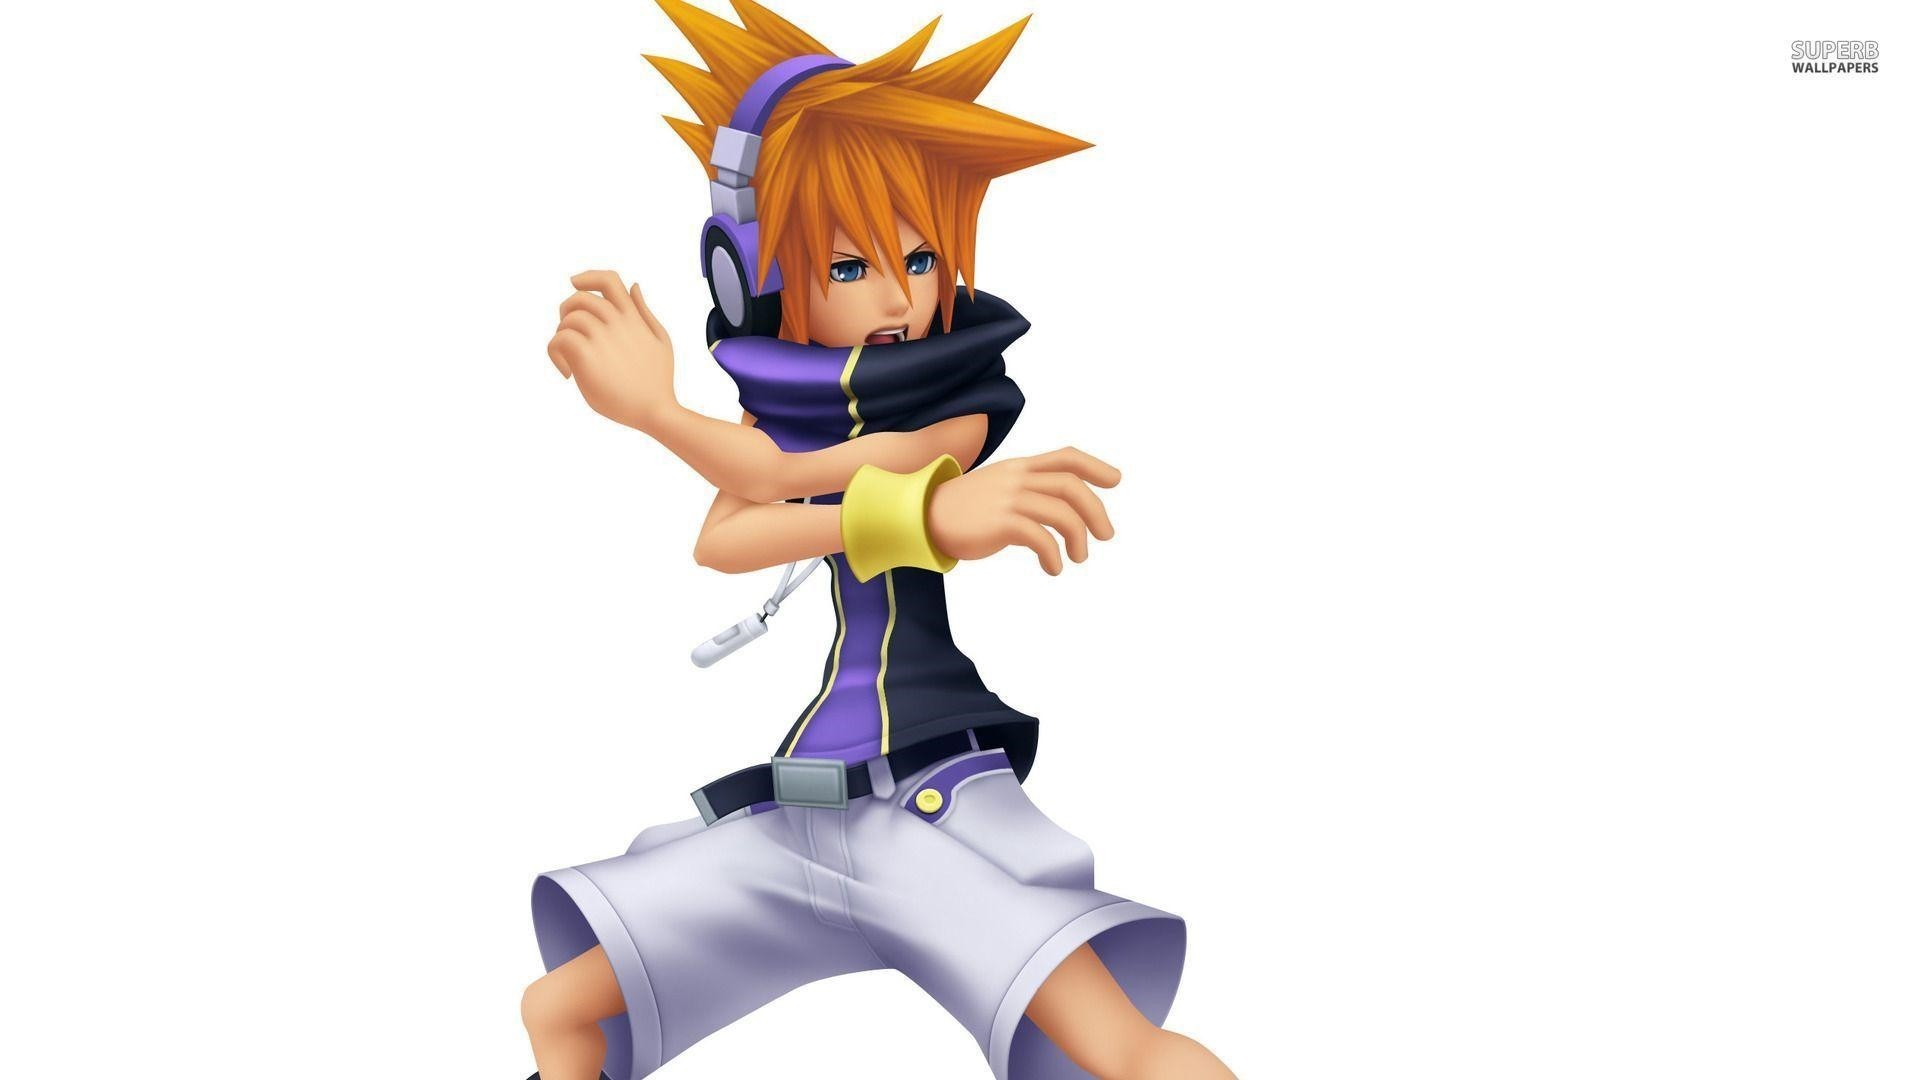 Kingdom Hearts 3 HD Wallpaper